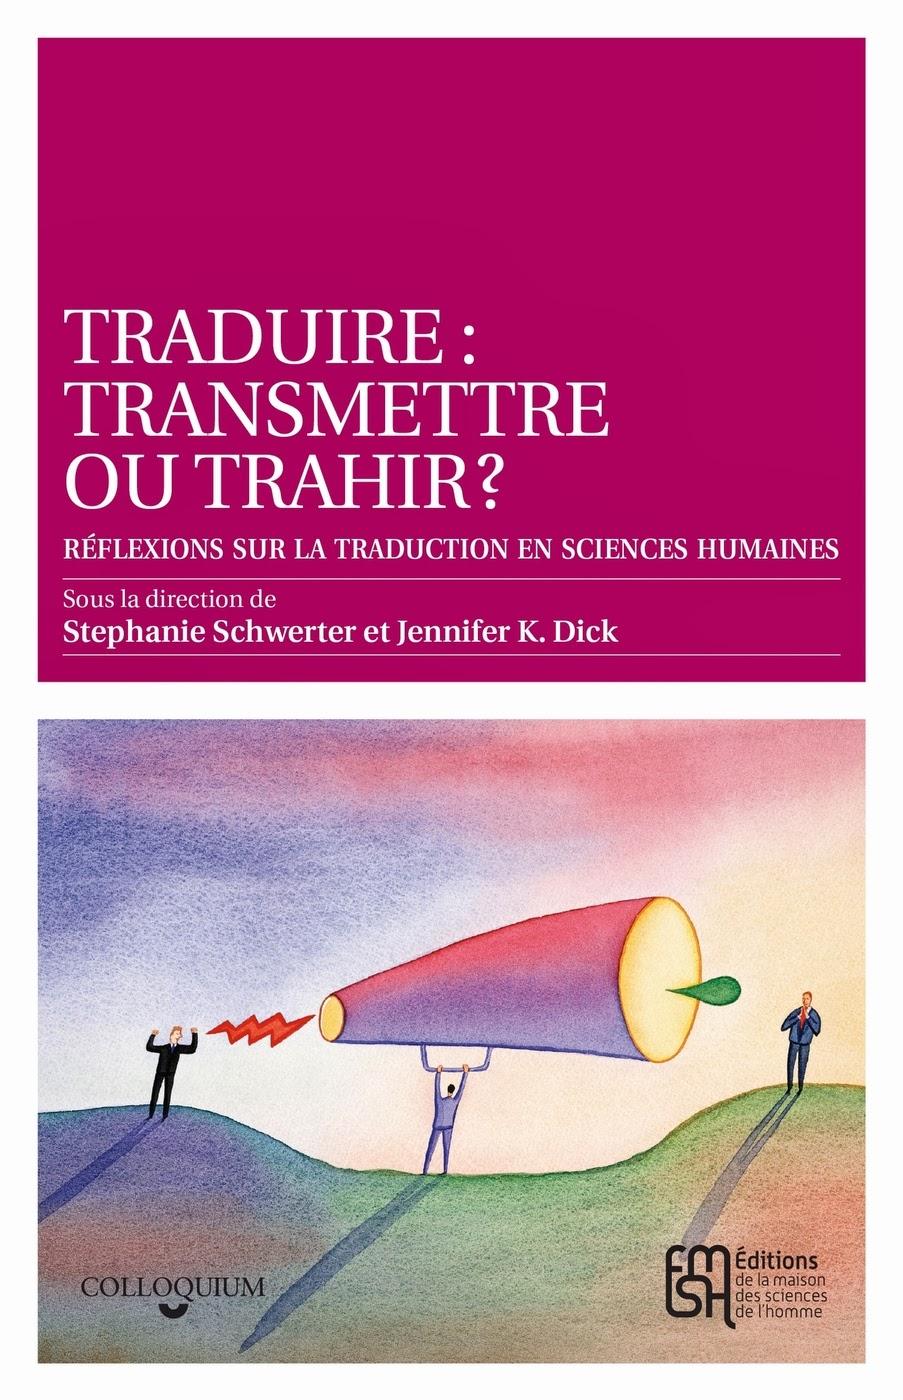 Jennifer K Dick and Stephanie Schwerter's Traduire: transmettre ou trahir? (MSH, 2013)